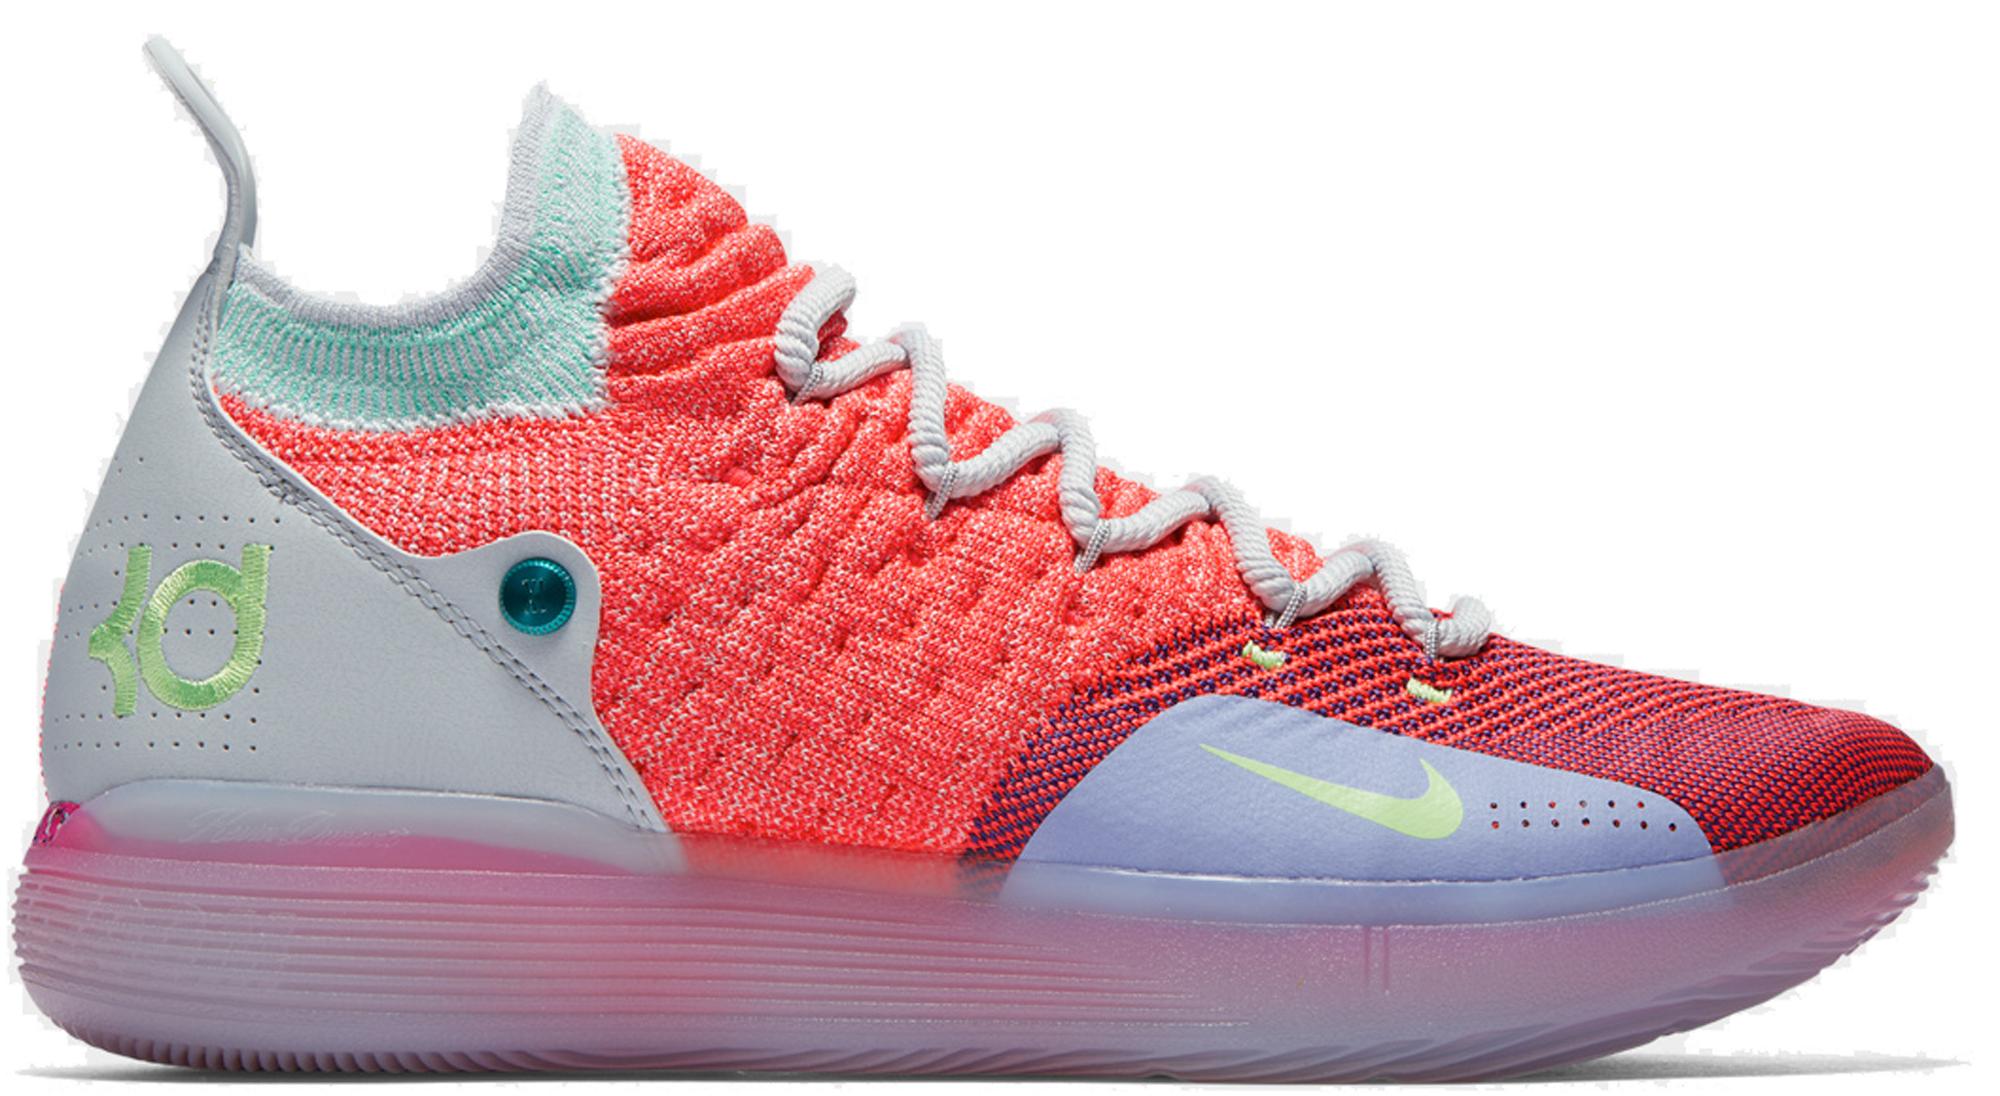 Nike KD 11 EYBL